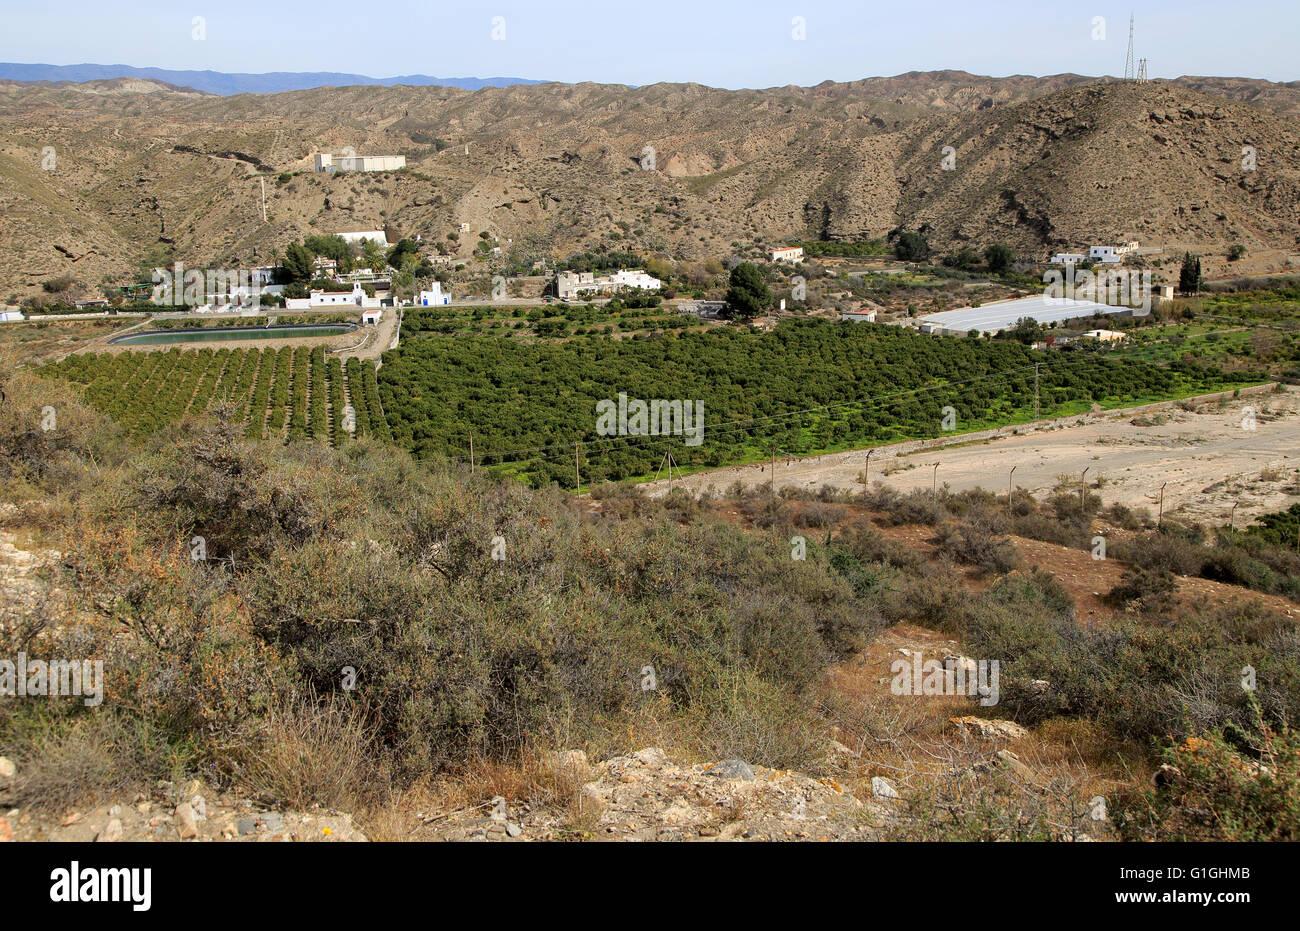 Fruit farming in River Andarax valley viewed from Los Millares prehistoric settlement, near Gador, Almeria, Spain - Stock Image